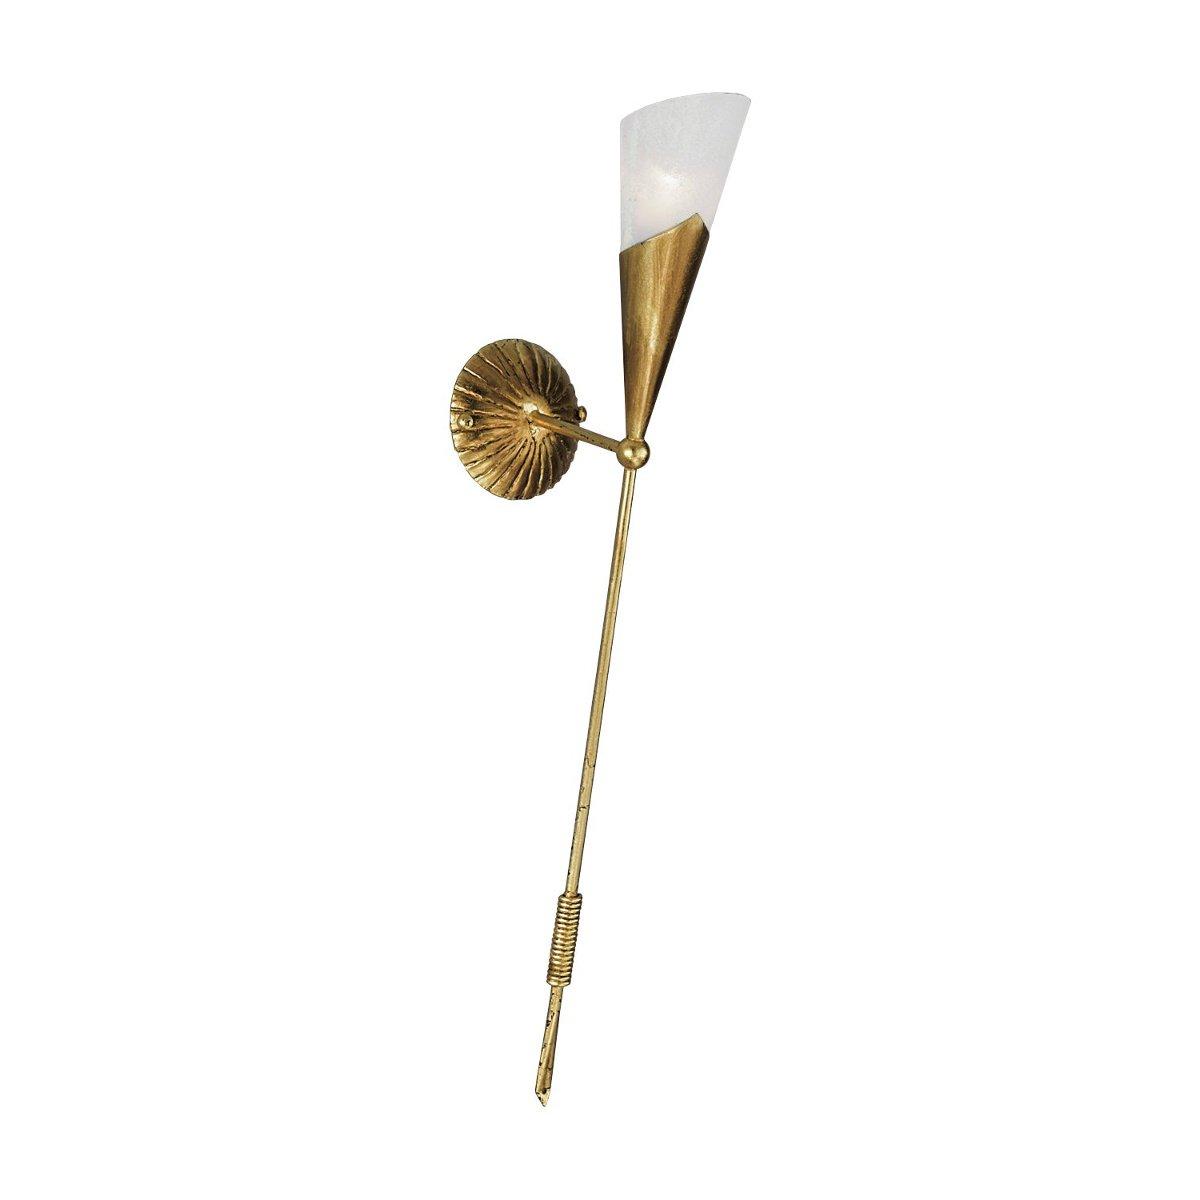 dekorative wandfackel im modernen landhausstil von hans k gl bei lampen suntinger shop. Black Bedroom Furniture Sets. Home Design Ideas